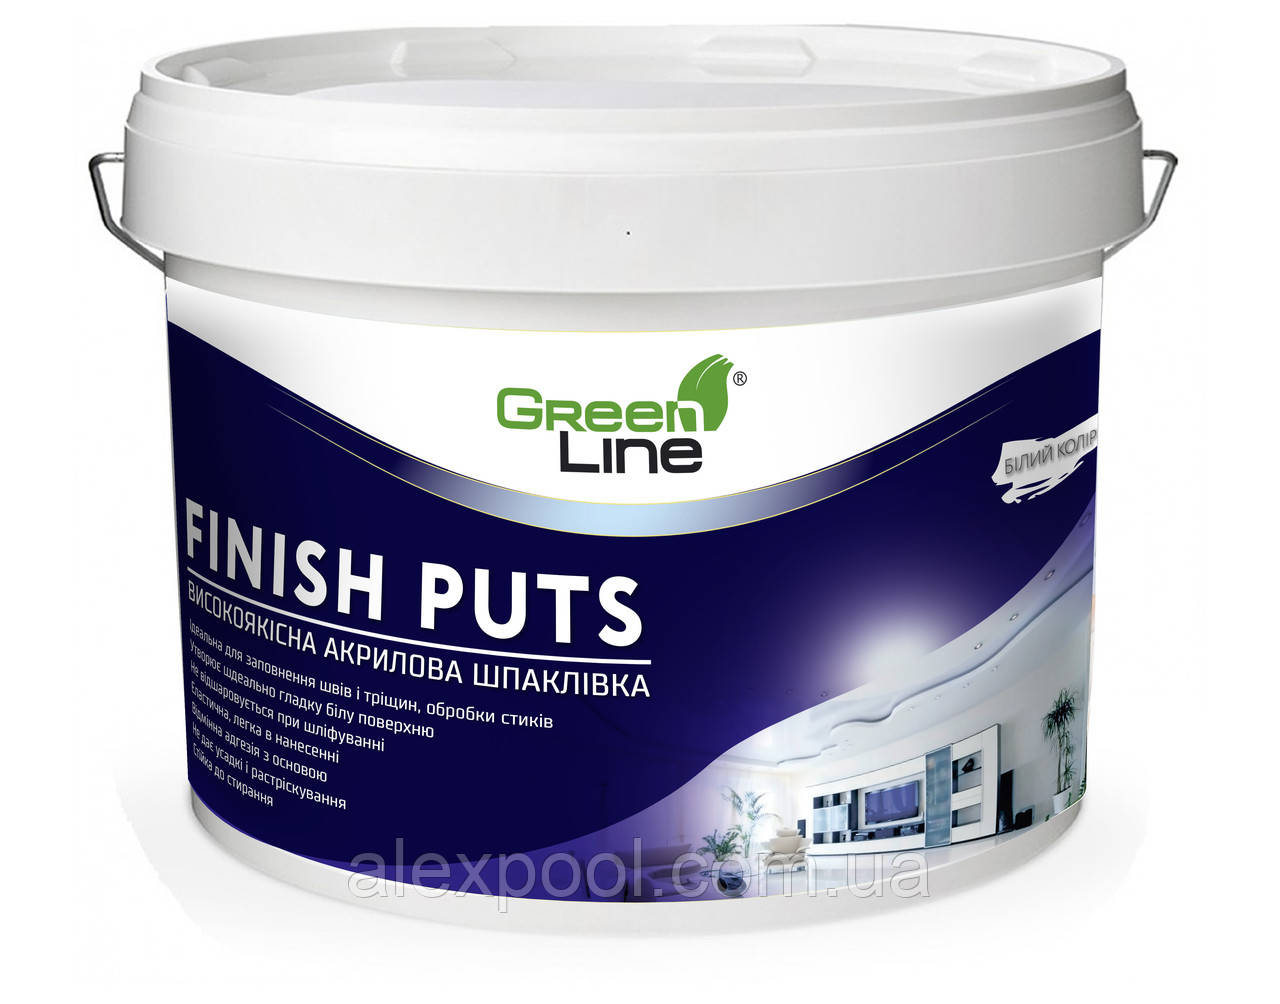 Фінішна акрилова шпаклівка TM Green Line FINISH PUTS 1 л